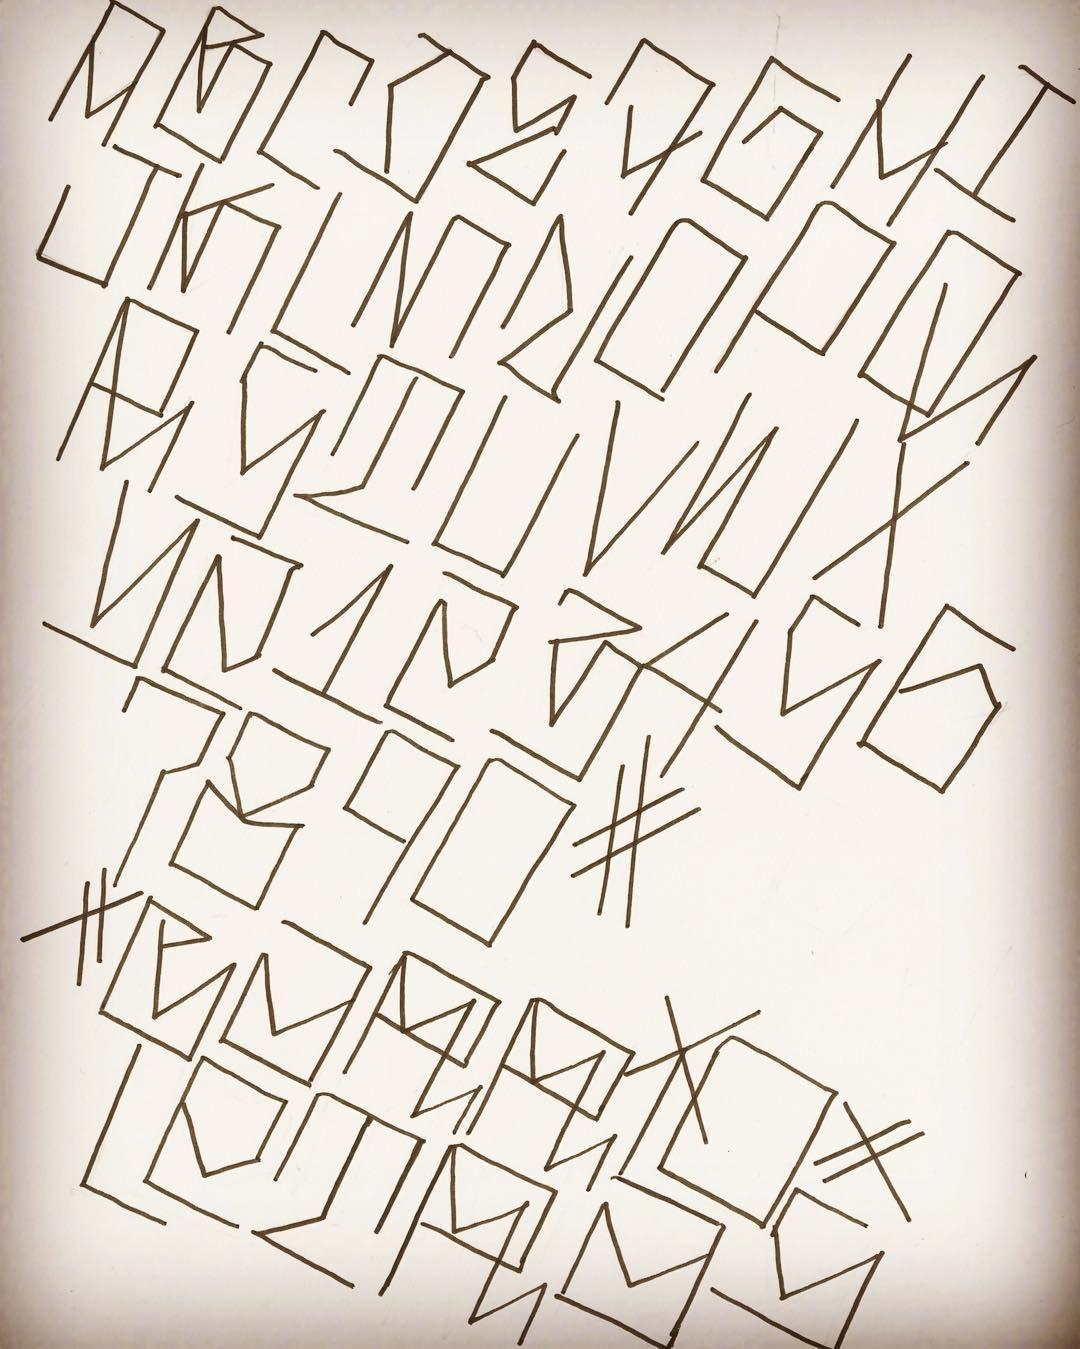 ALPHABET... #letterstoliveby #bigsleeps #handstyles